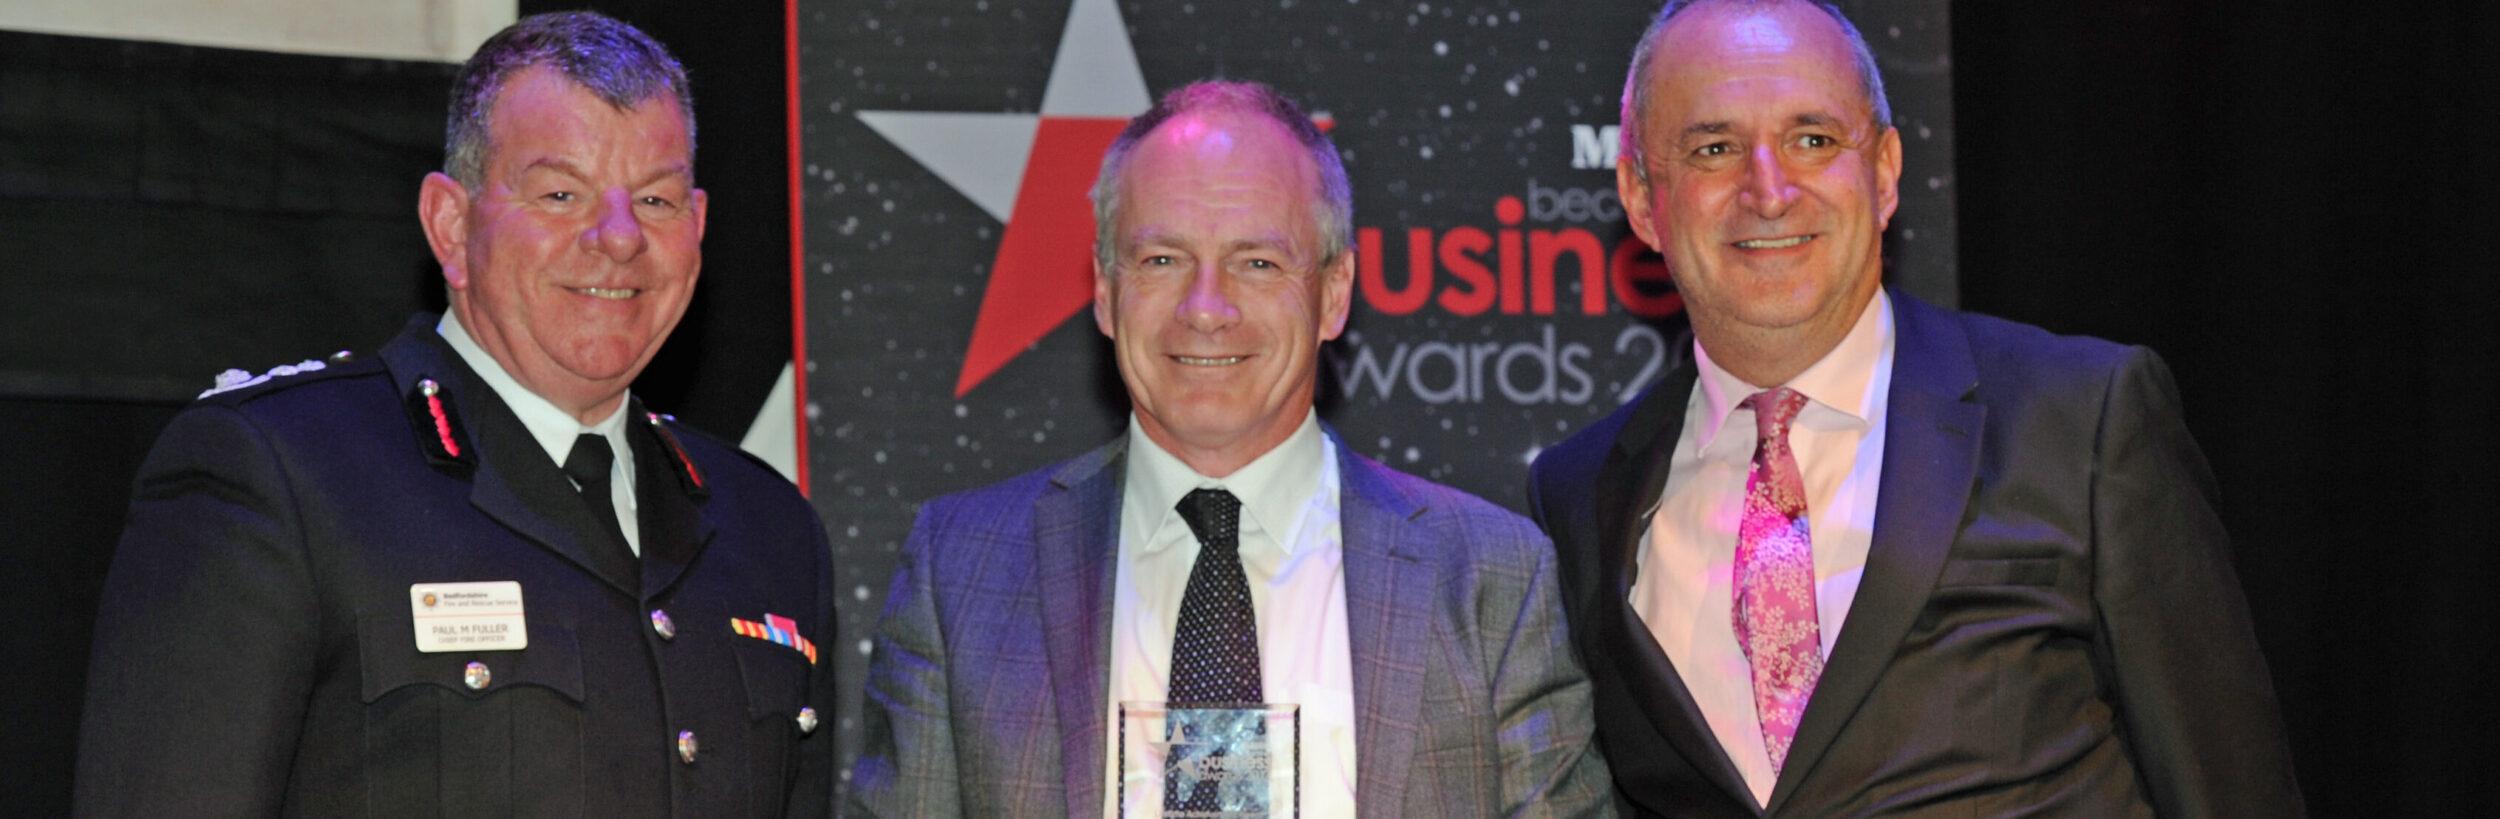 ian-awards-2017-winner